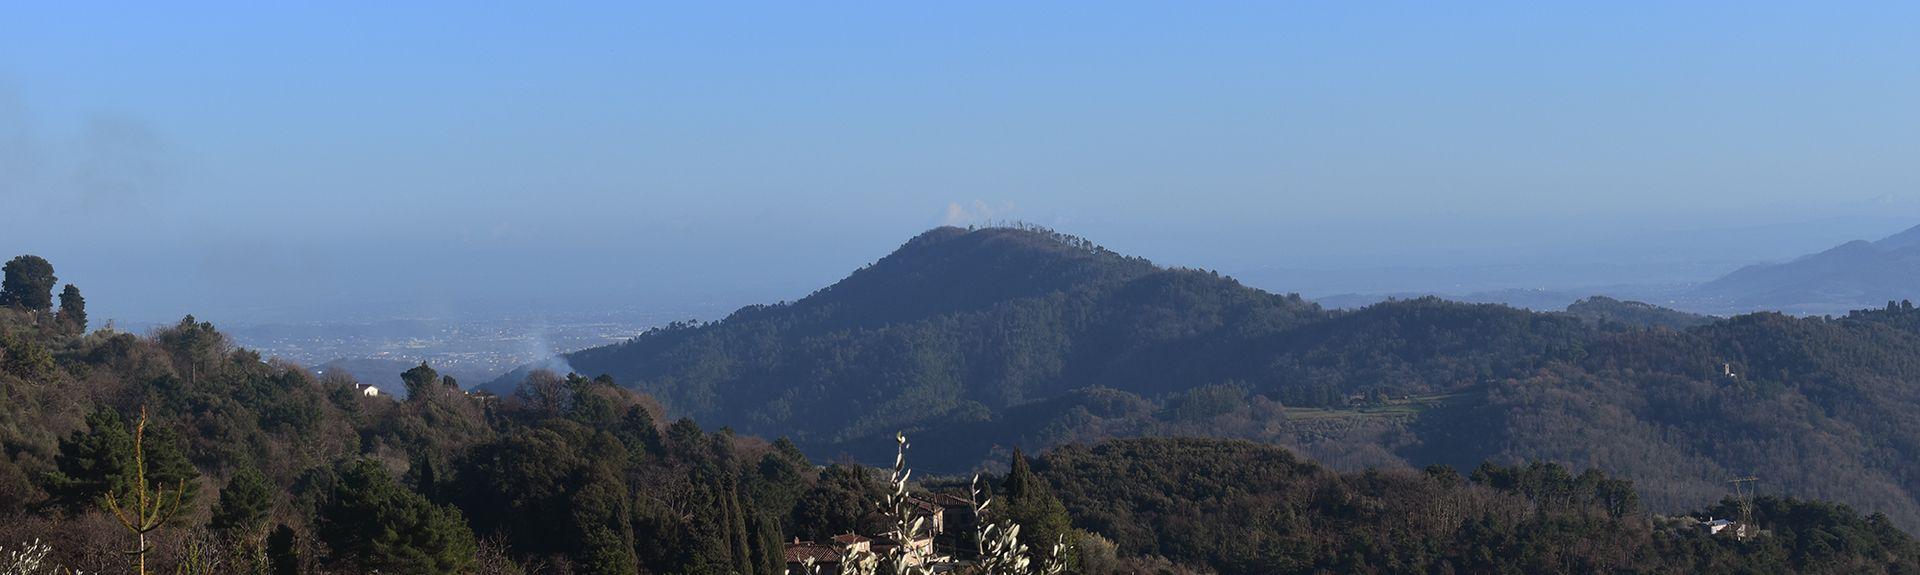 Coreglia Antelminelli, Lucca, Tuscany, Italy